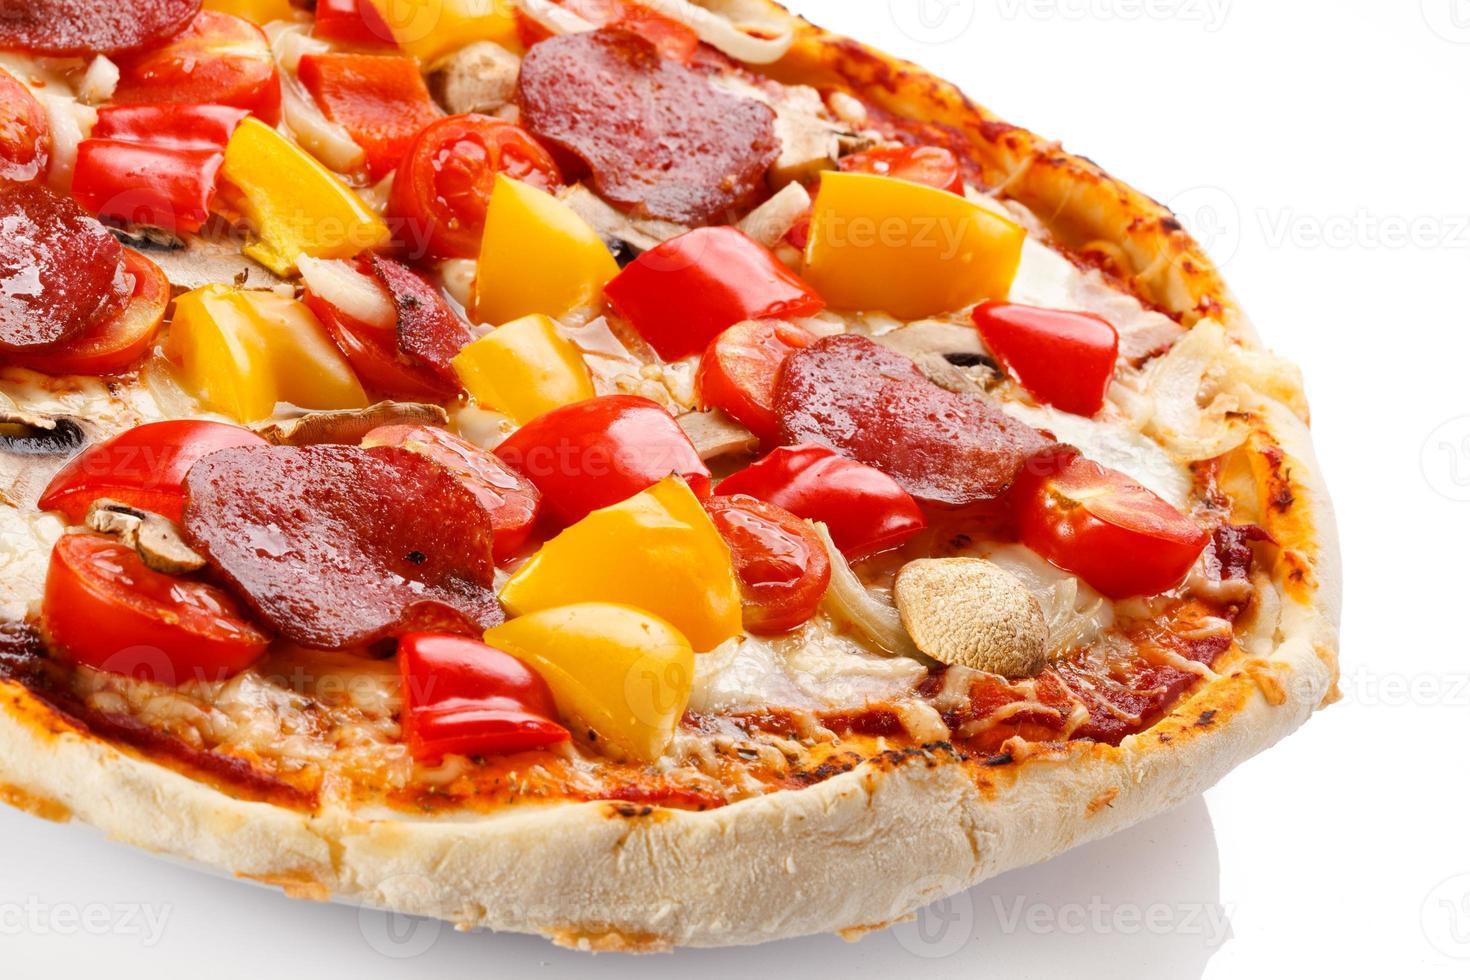 pizza op witte achtergrond foto